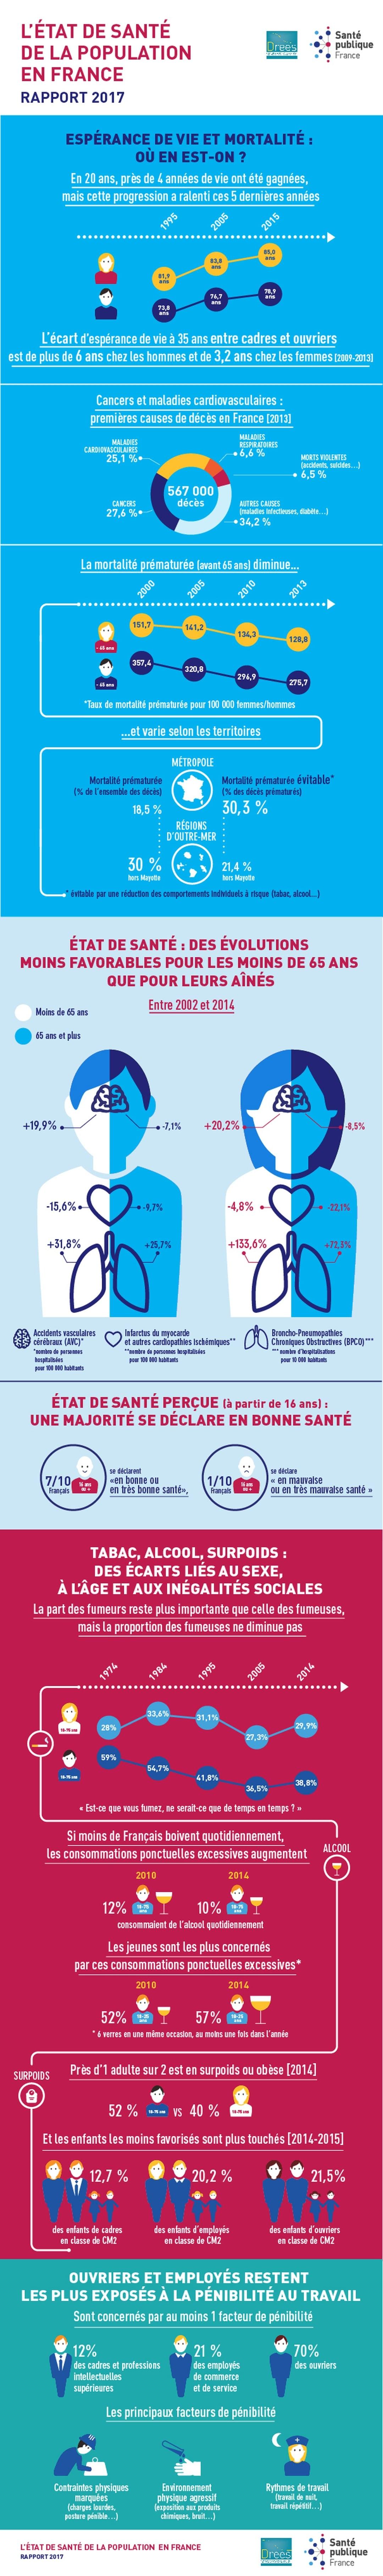 sante-population-France-chiffres